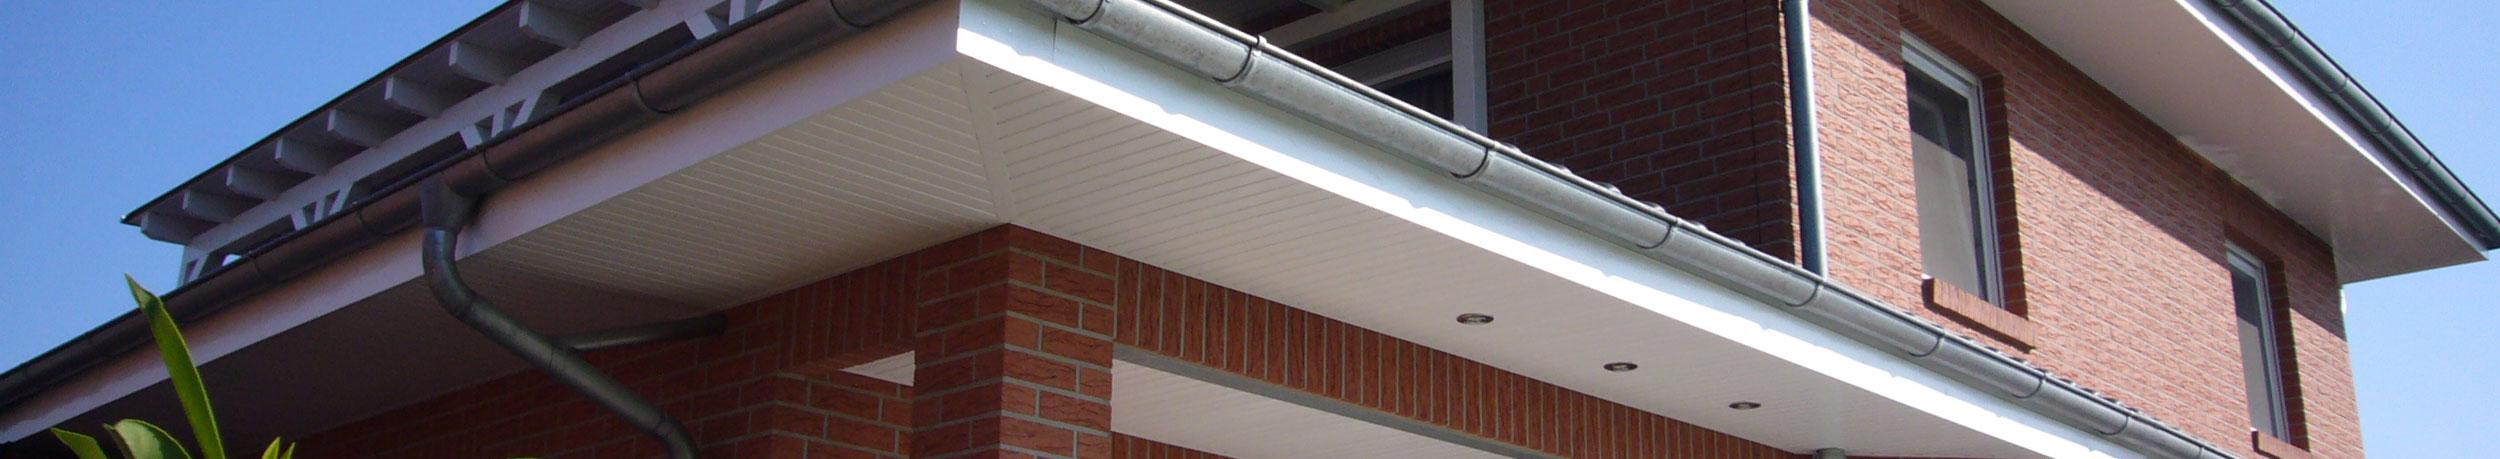 Balkonverkleidung Kunststoff Paneele Vinylit Multipaneel